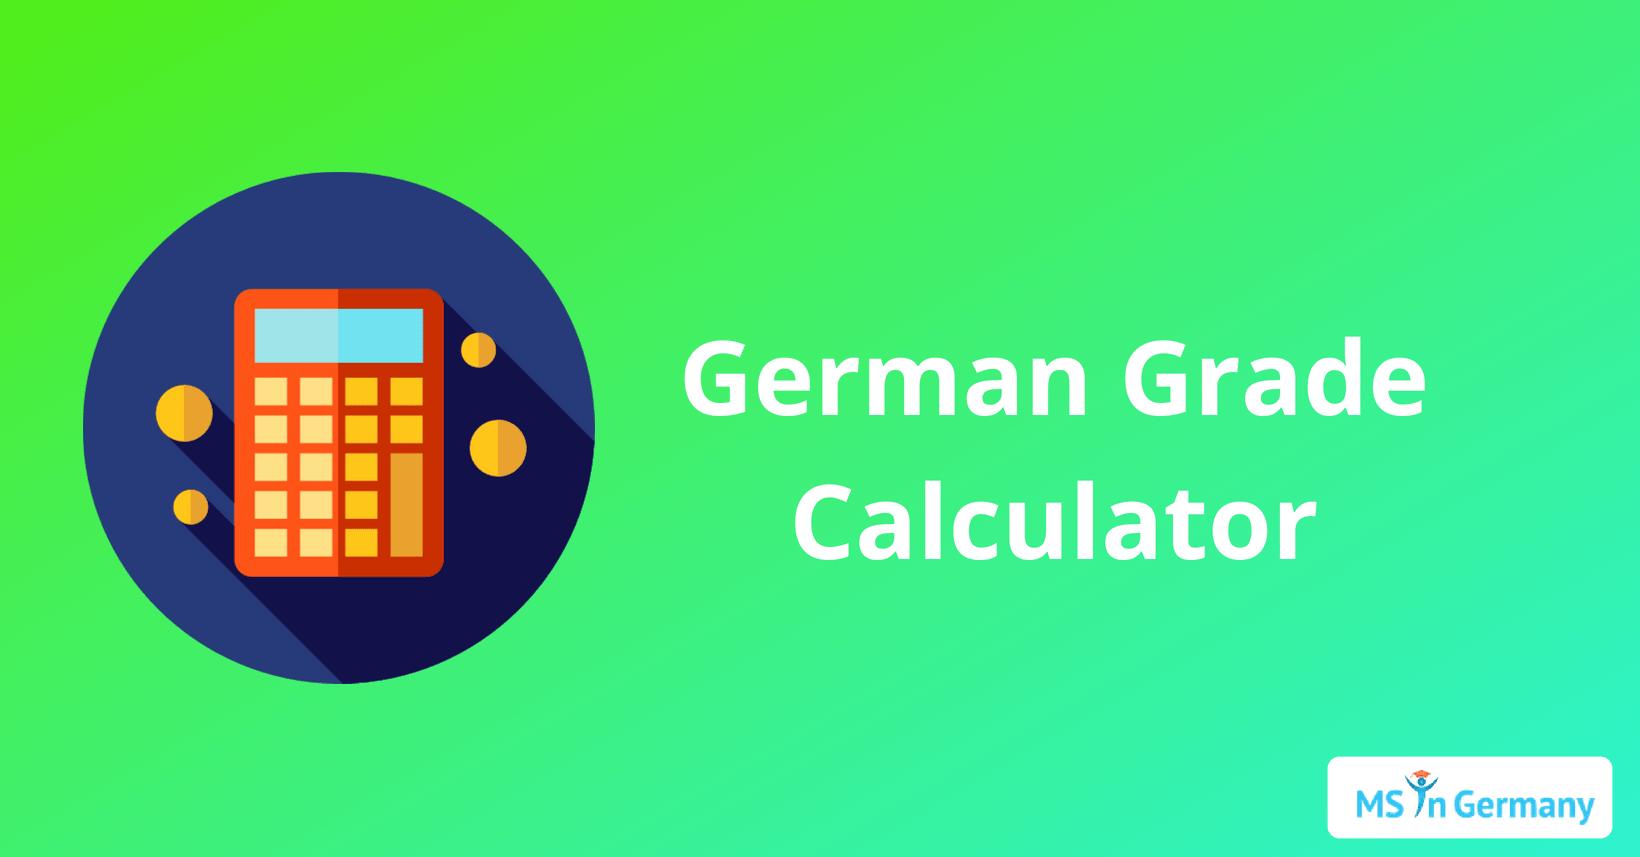 german grade calculator ms in germany